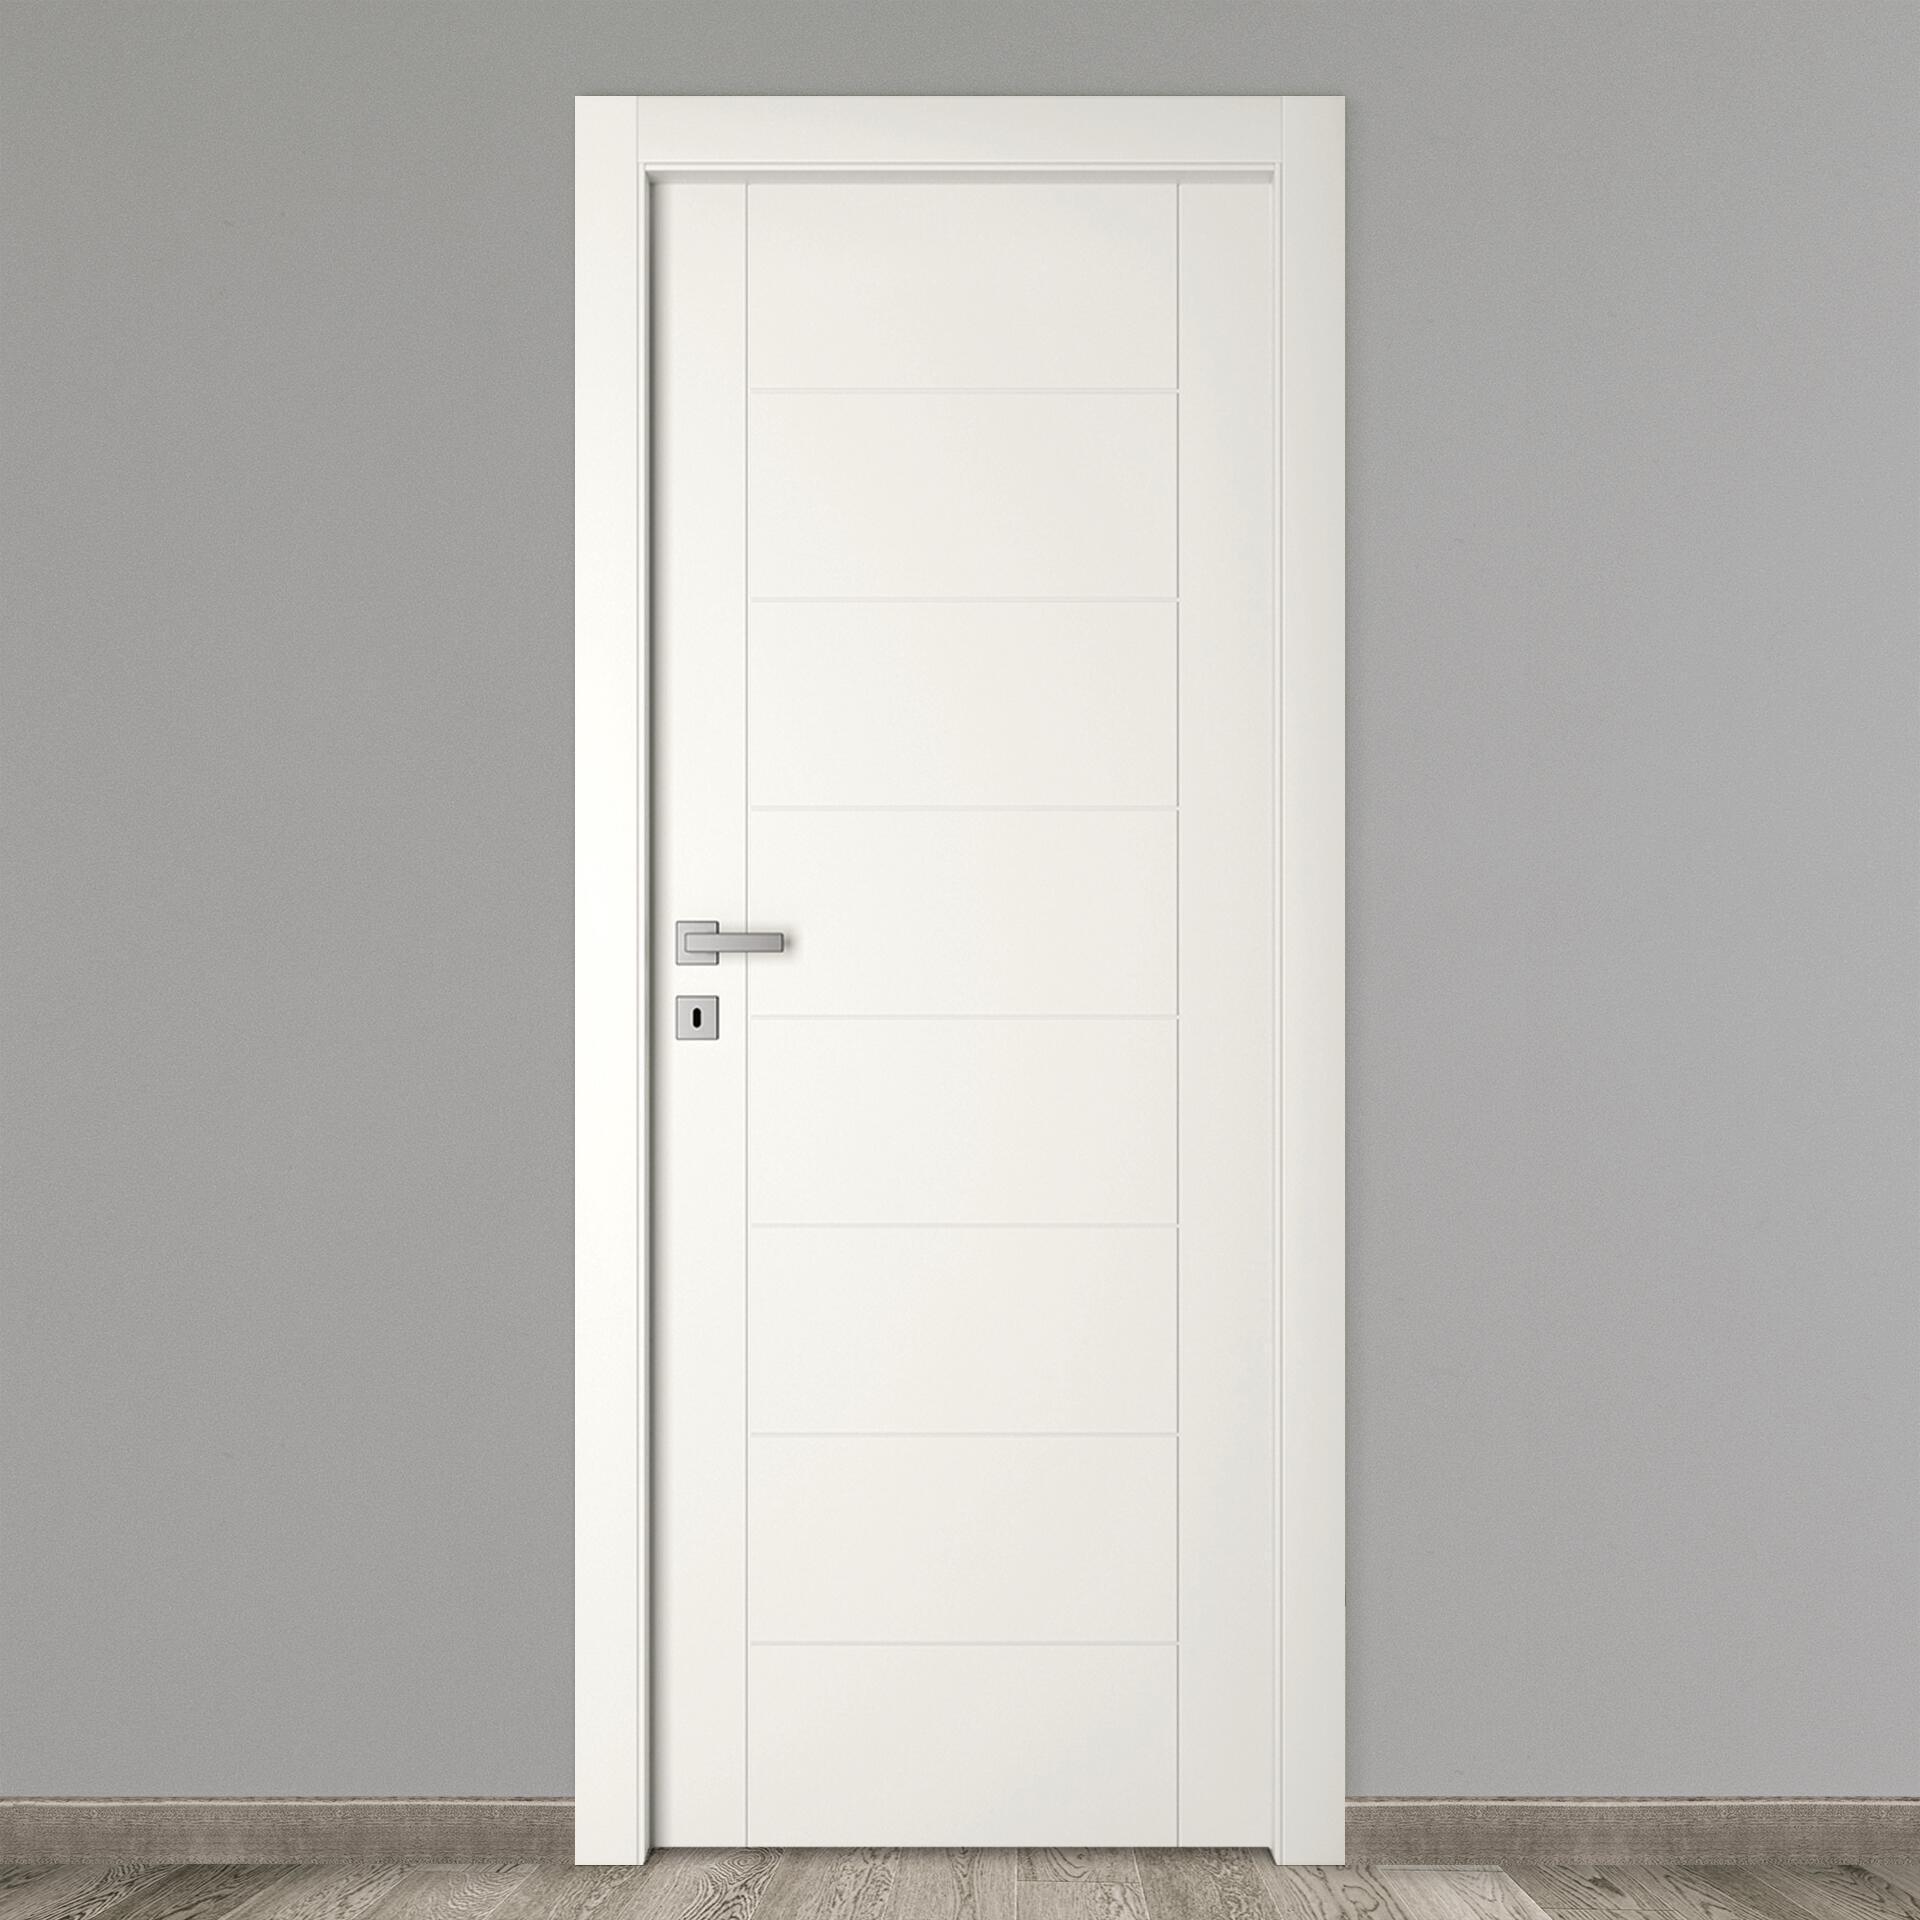 Porta a battente Chamberi bianco L 60 x H 210 cm reversibile - 3